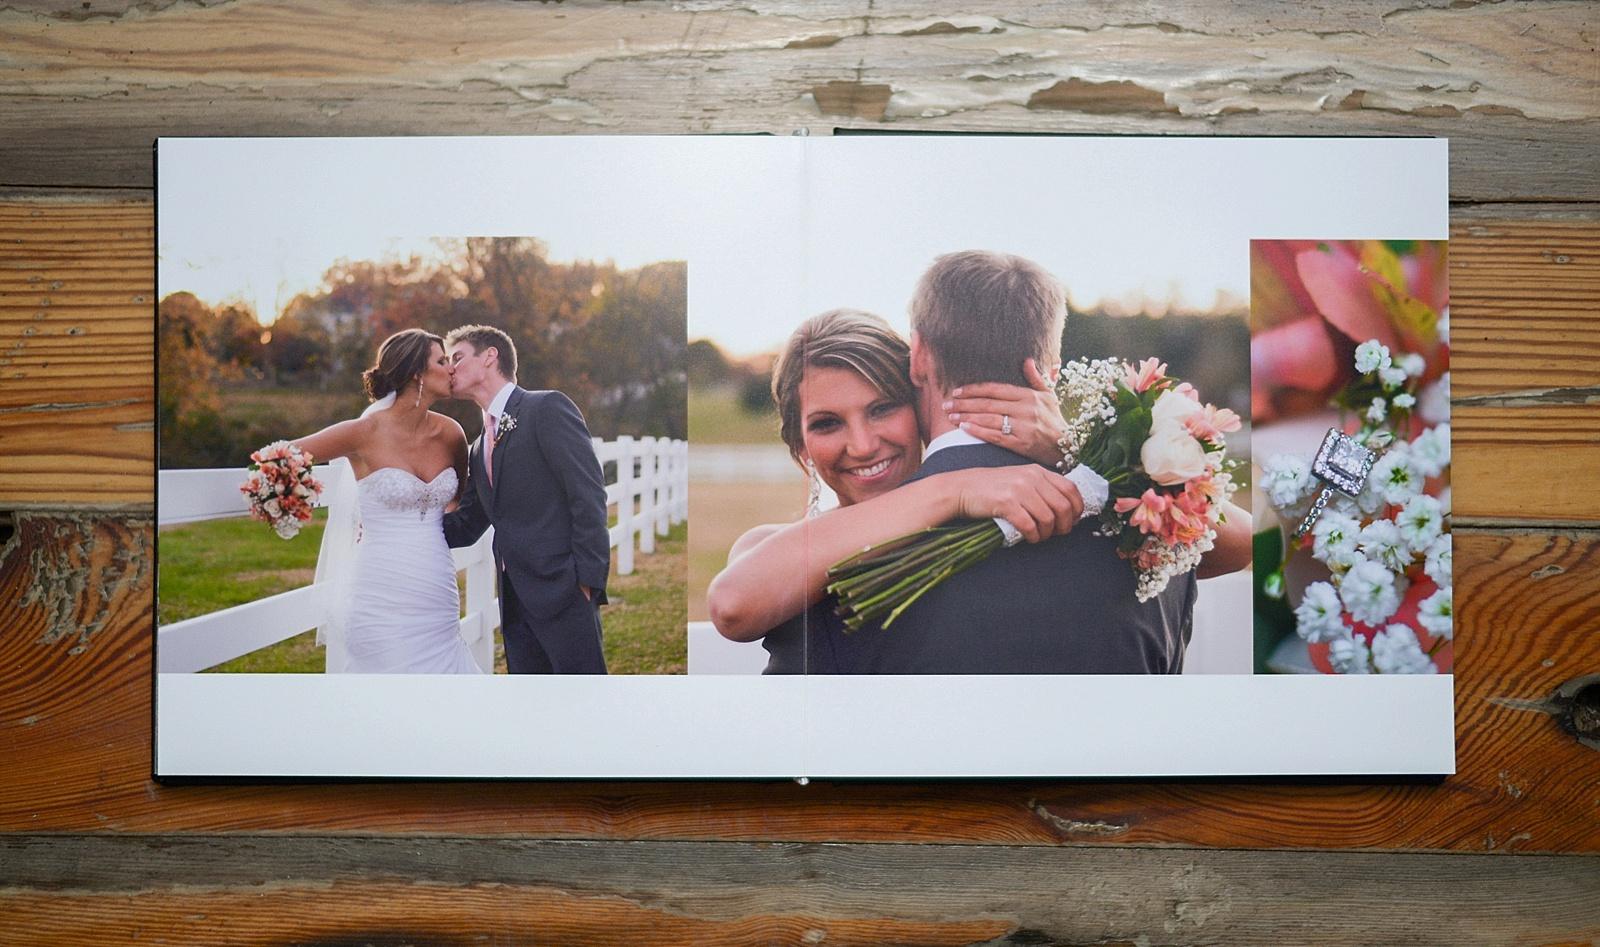 memento-wedding-album_0008.jpg